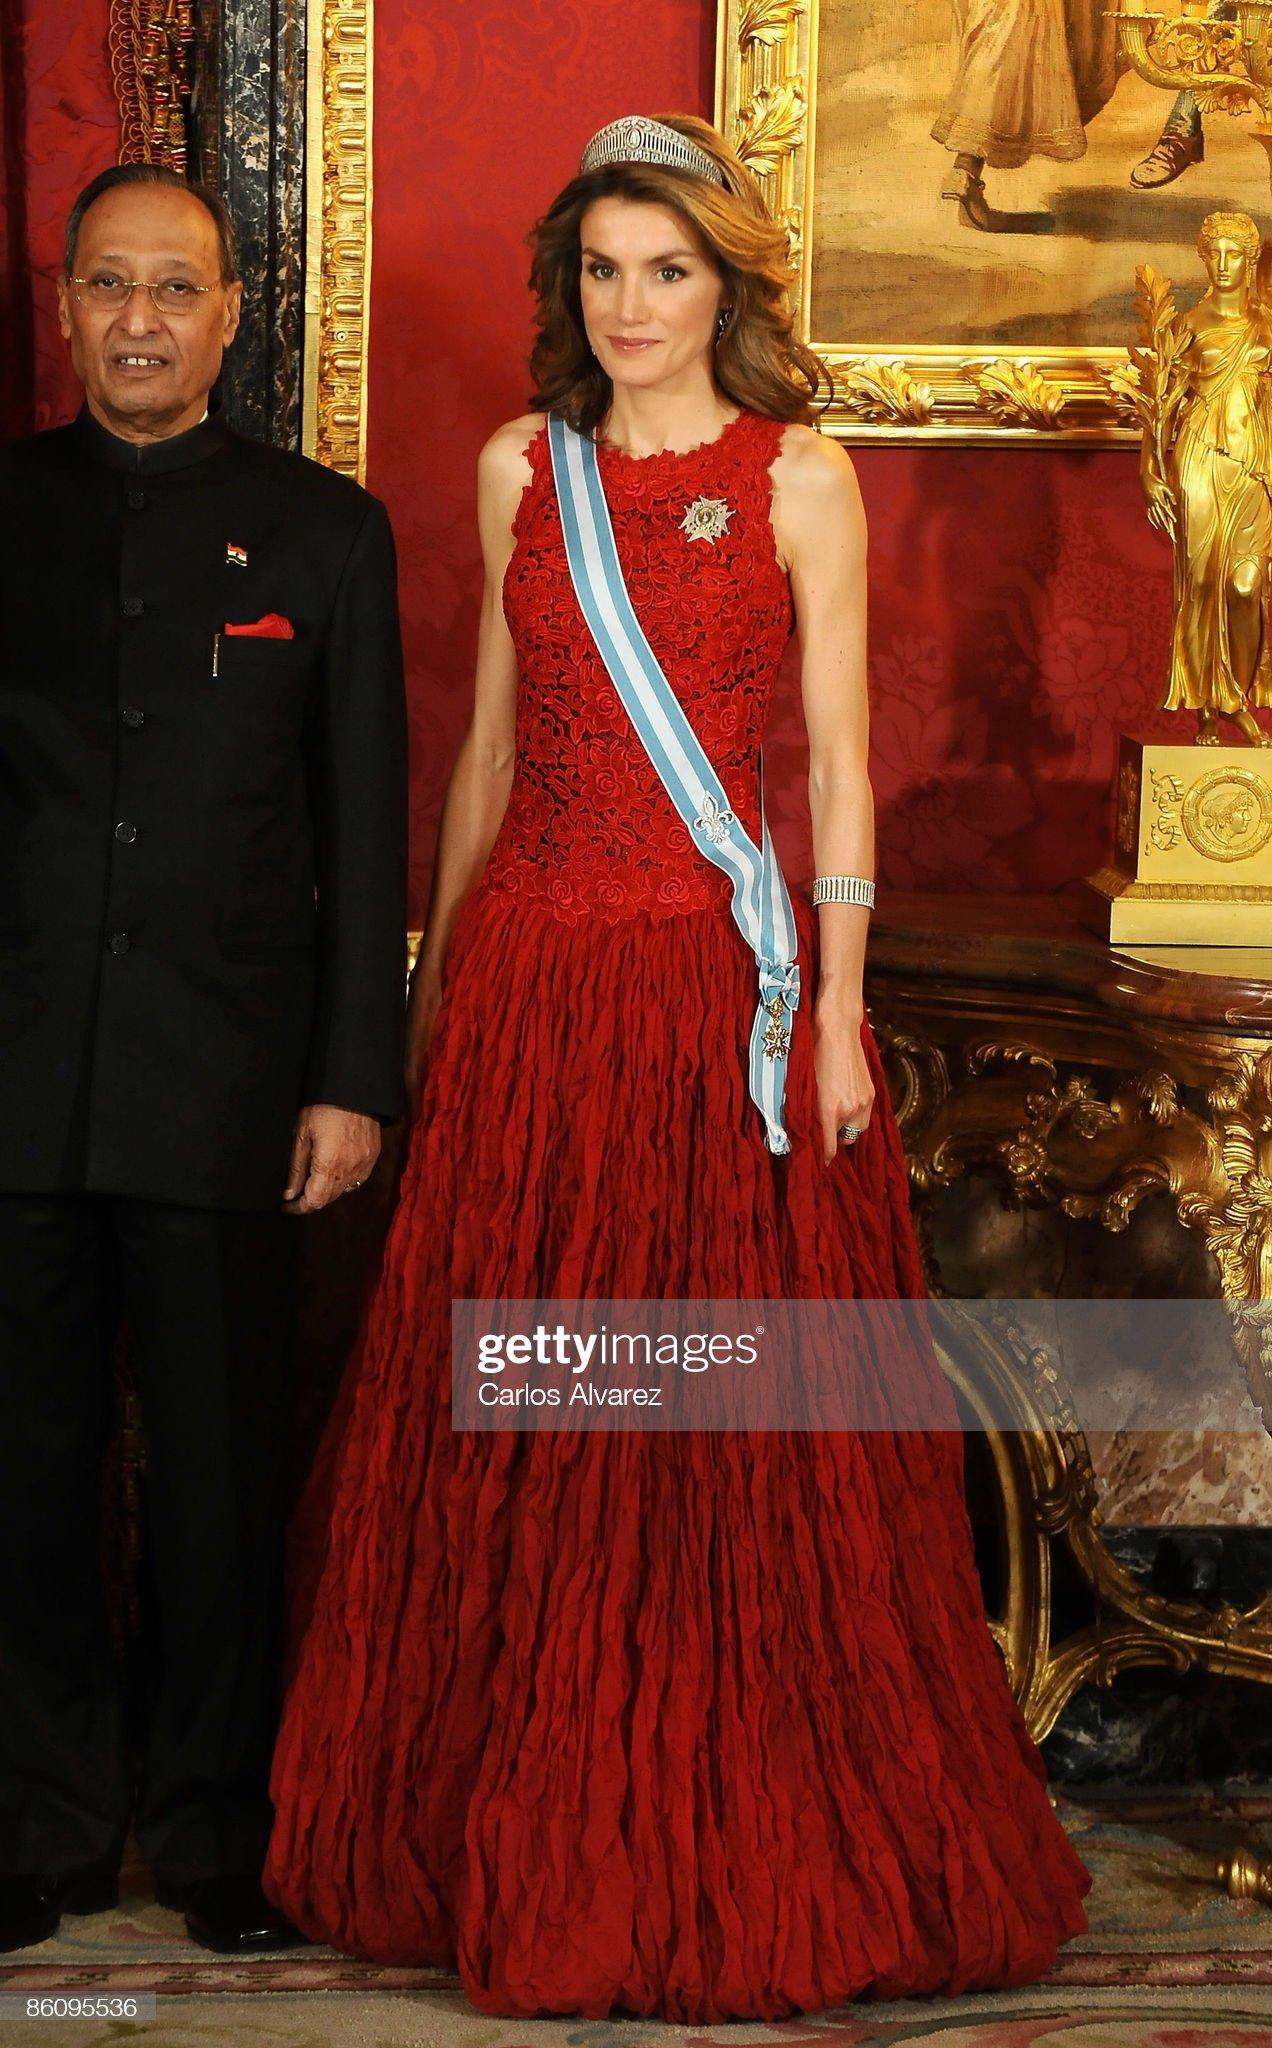 Вечерние наряды Королевы Летиции Spanish Royals Host Gala Dinner Honouring India President : News Photo